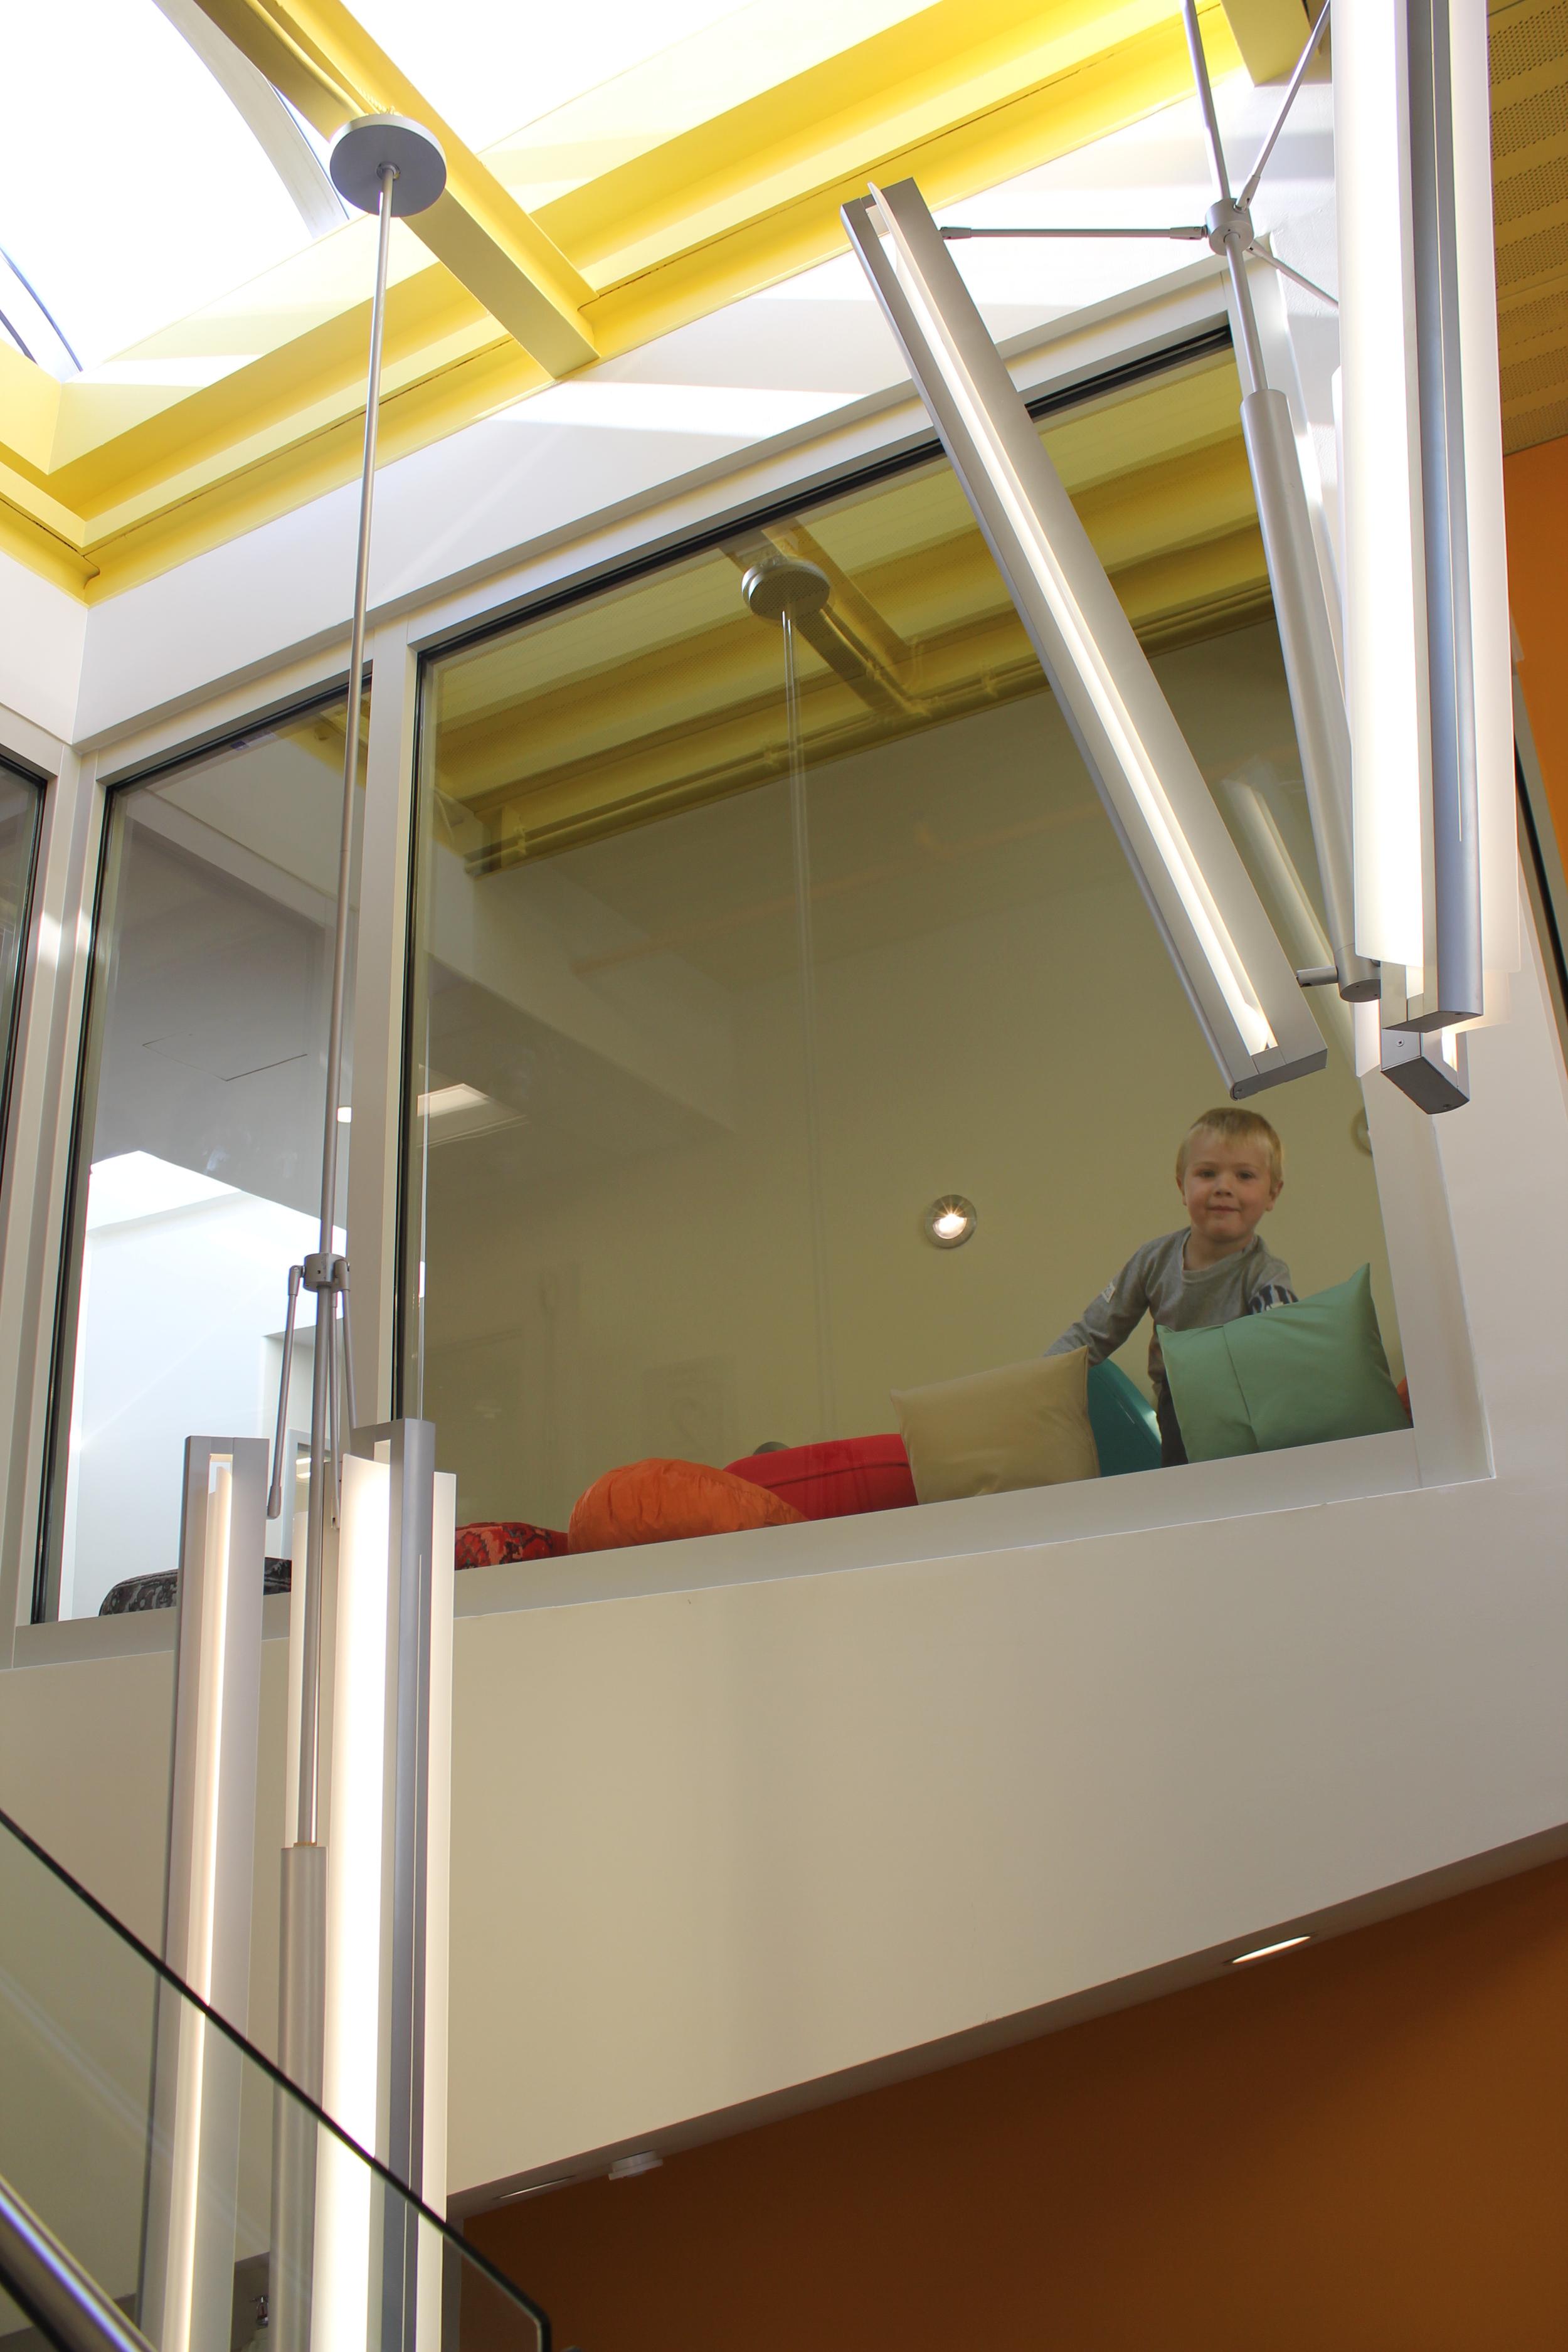 pho-int-stair loft-72ppi-48x72.JPG